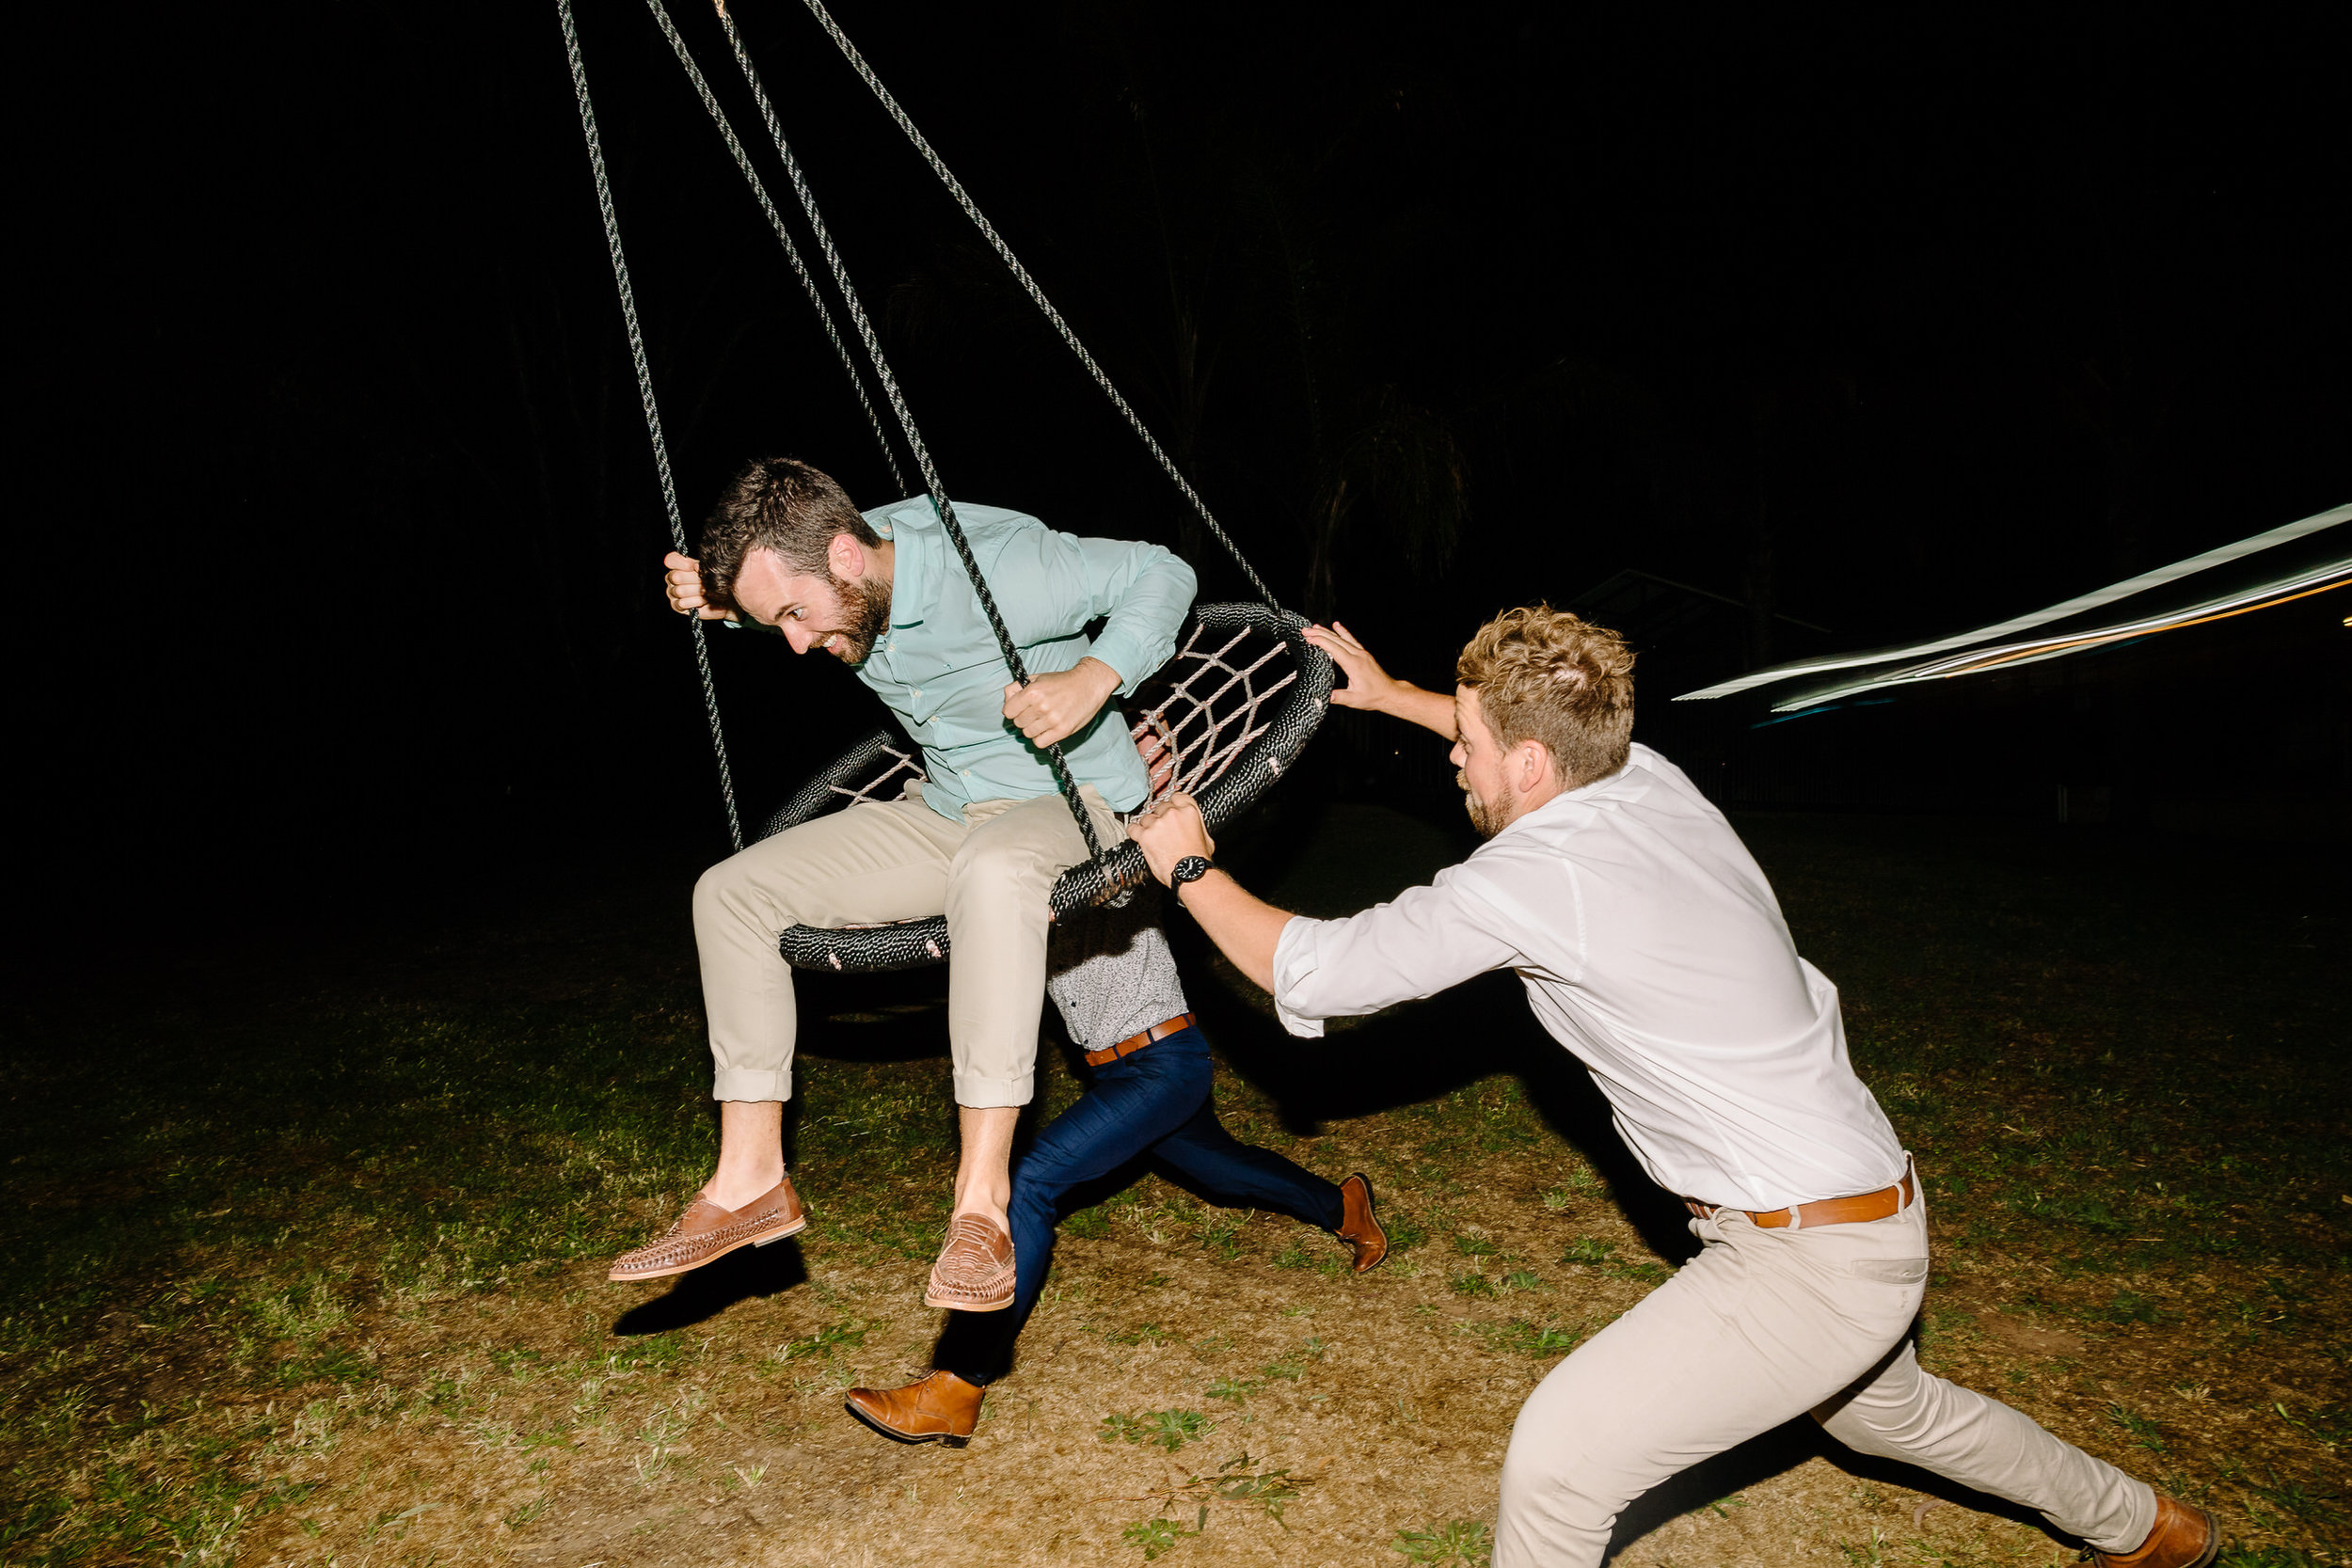 Justin_And_Jim_Photography_Backyard_Wedding238.JPG